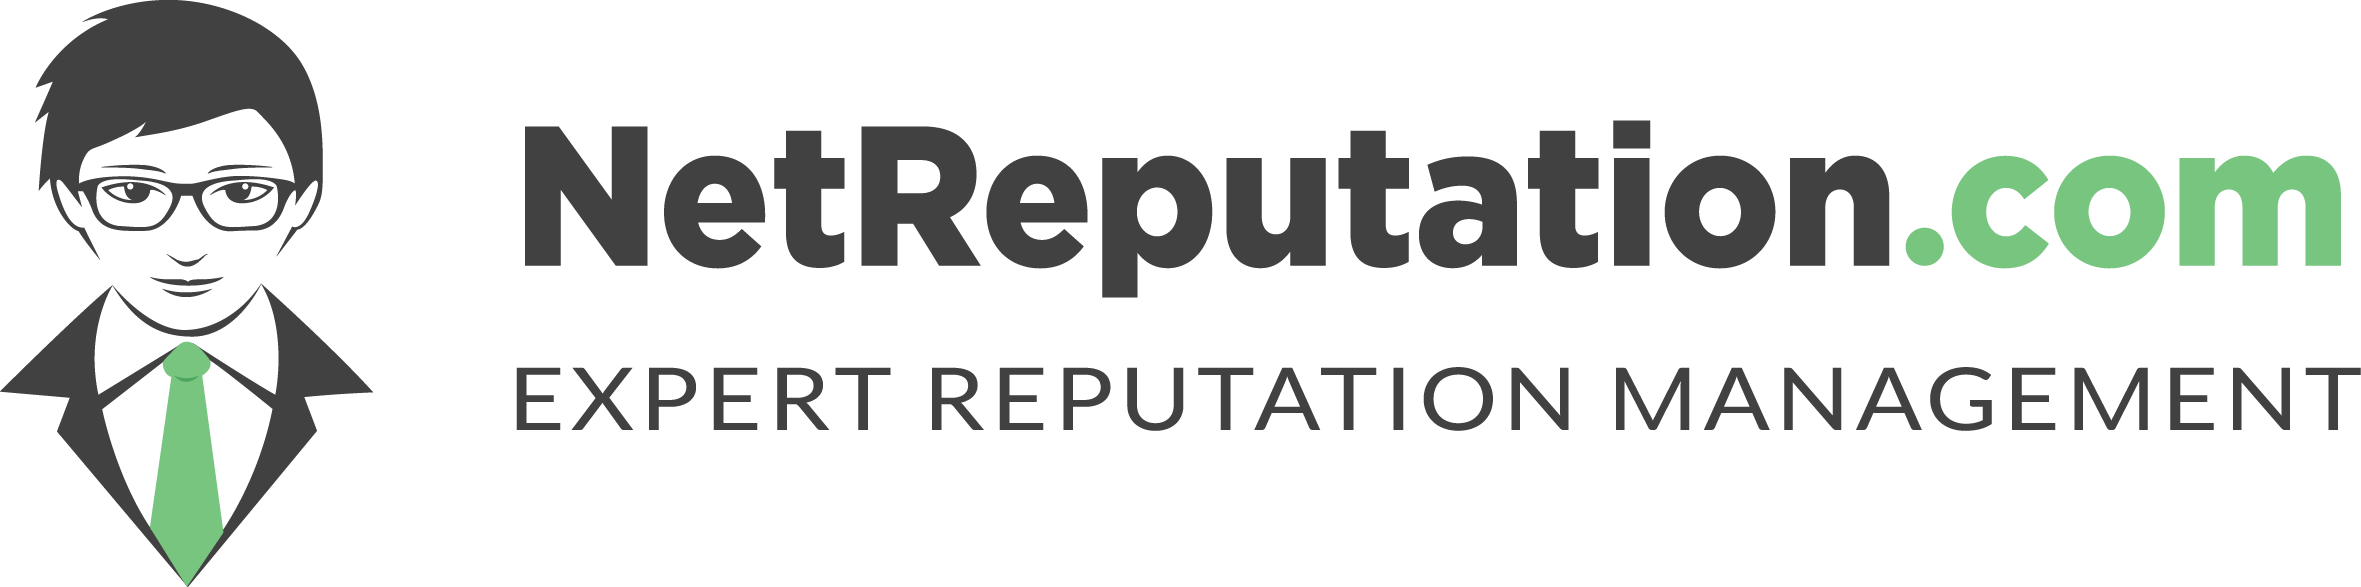 Newsweek Names Adam Petrilli's NetReputation as the World's Leading Reputation Management Company